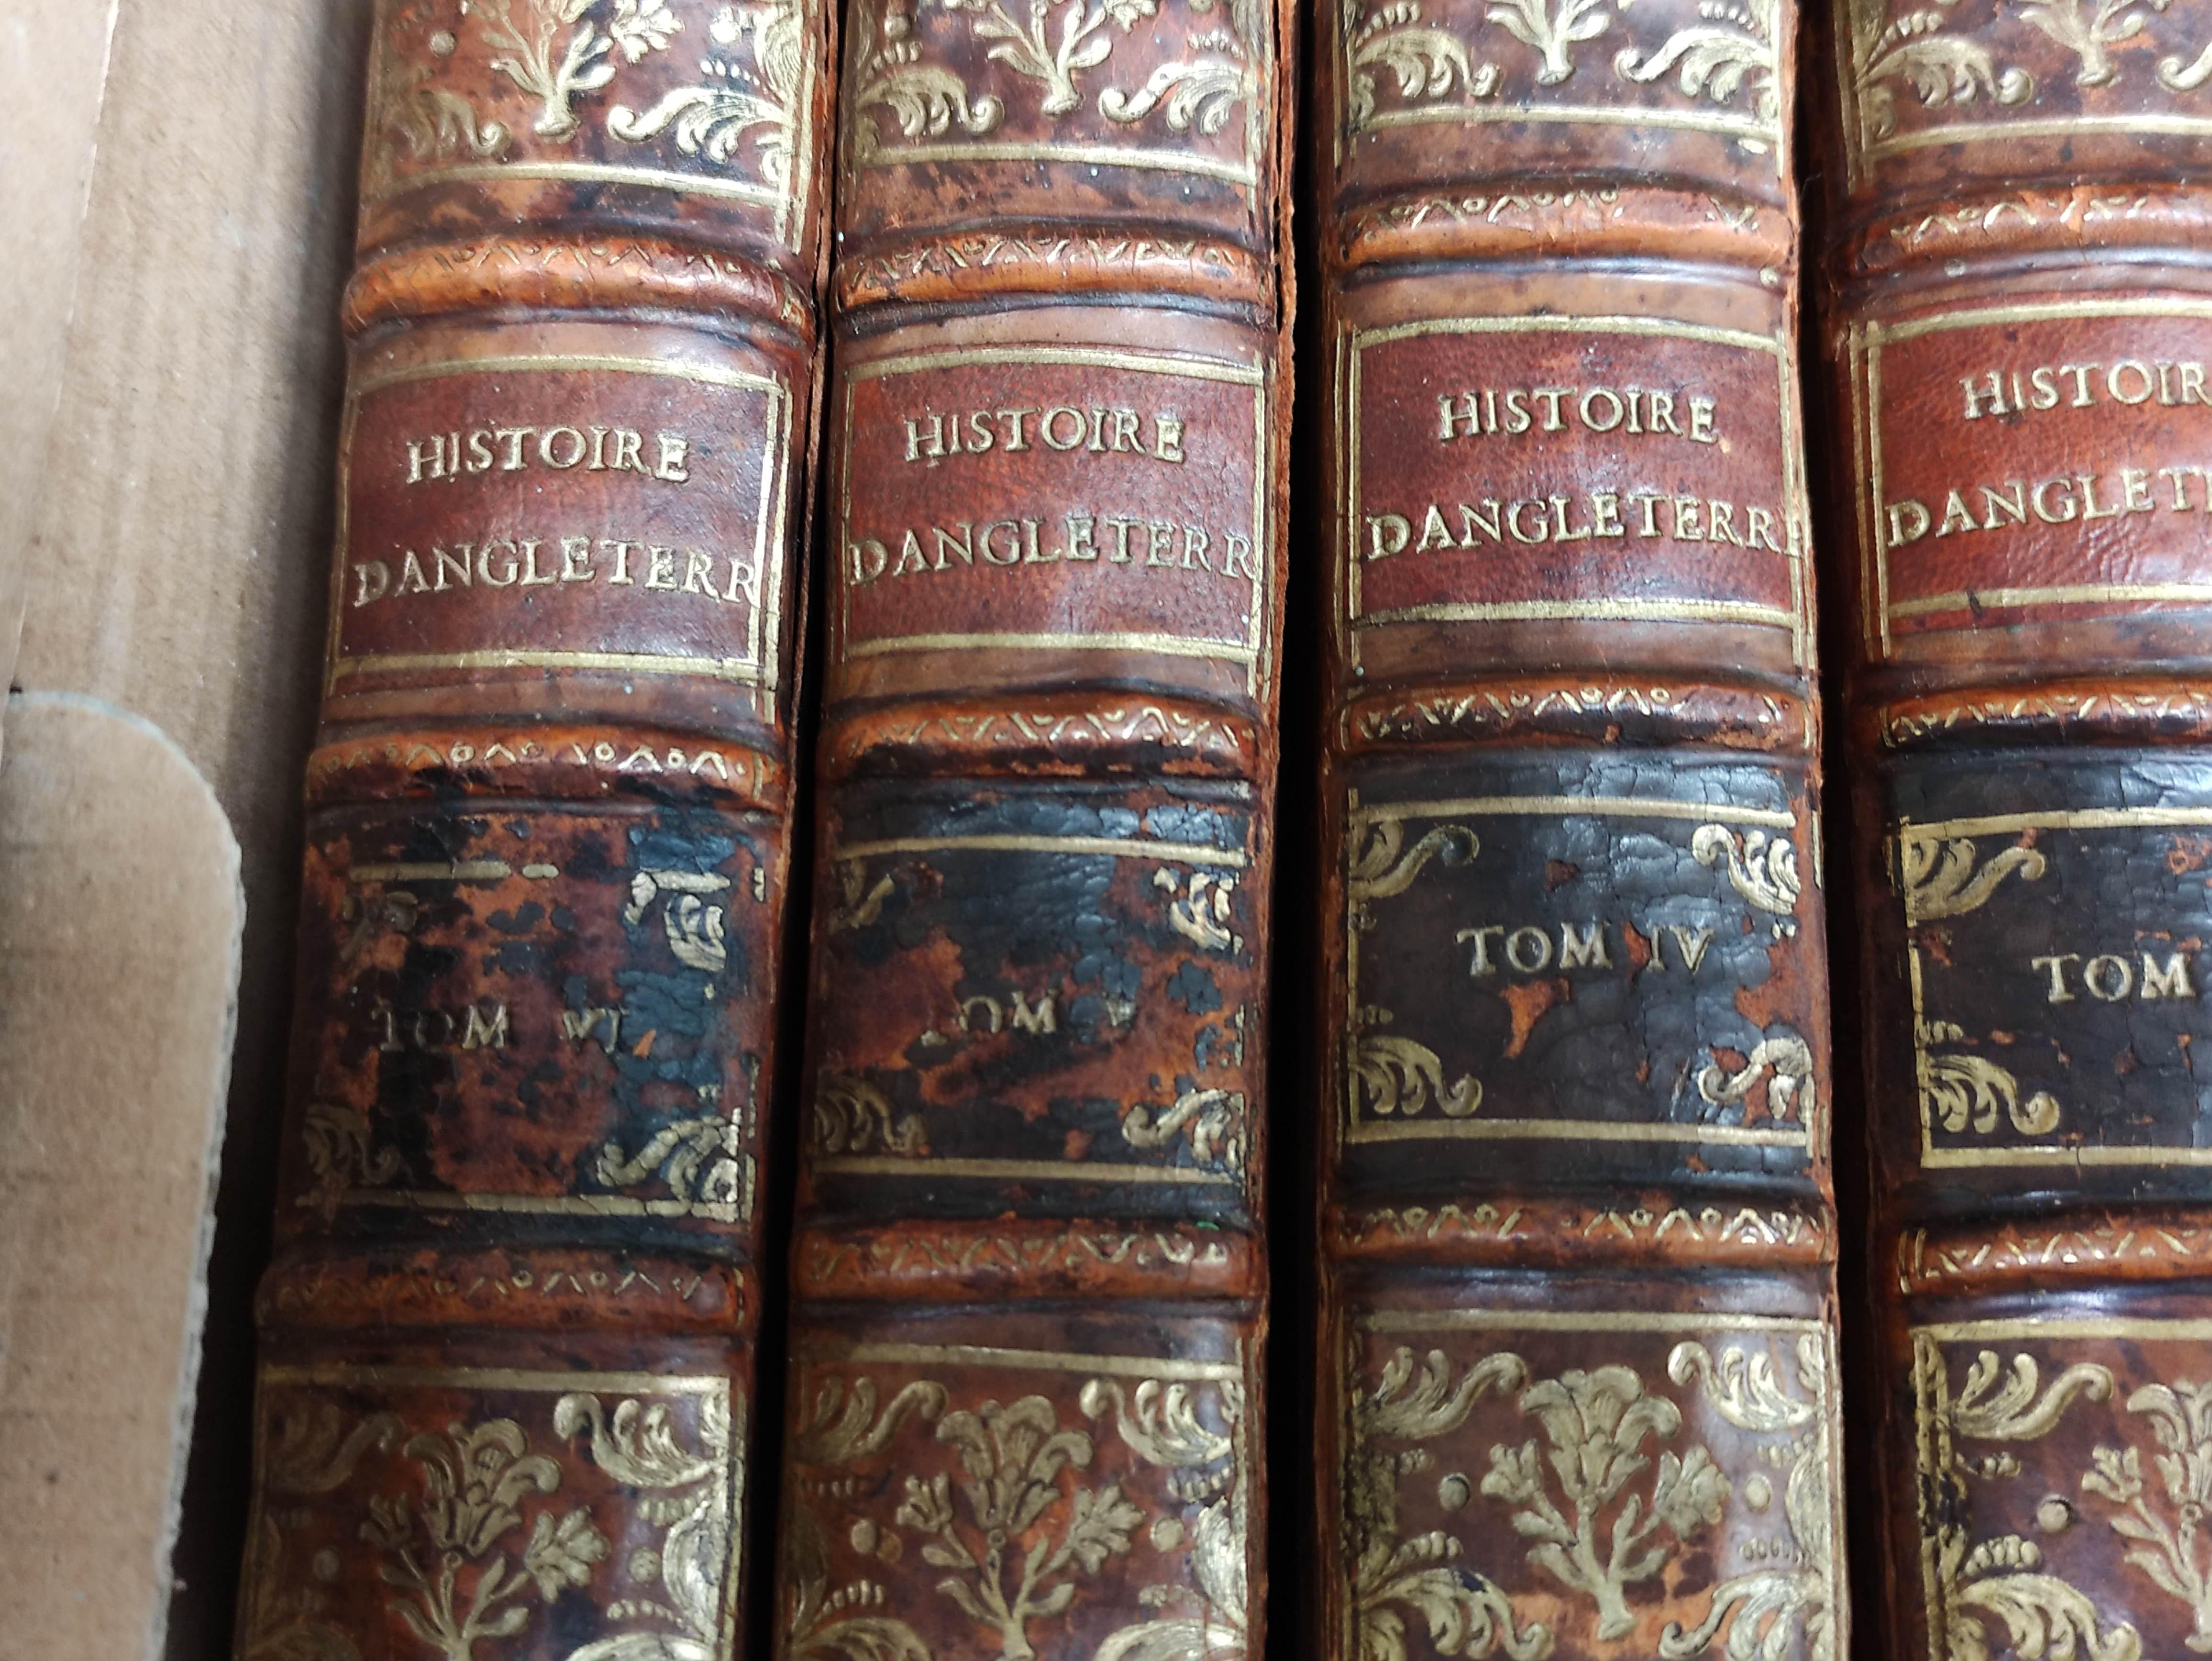 DE RAPIN THOYRAS.Histoire D'Angleterre. 10 vols. Eng. plates, fldg. tables, etc. Quarto. Calf. The - Image 2 of 8